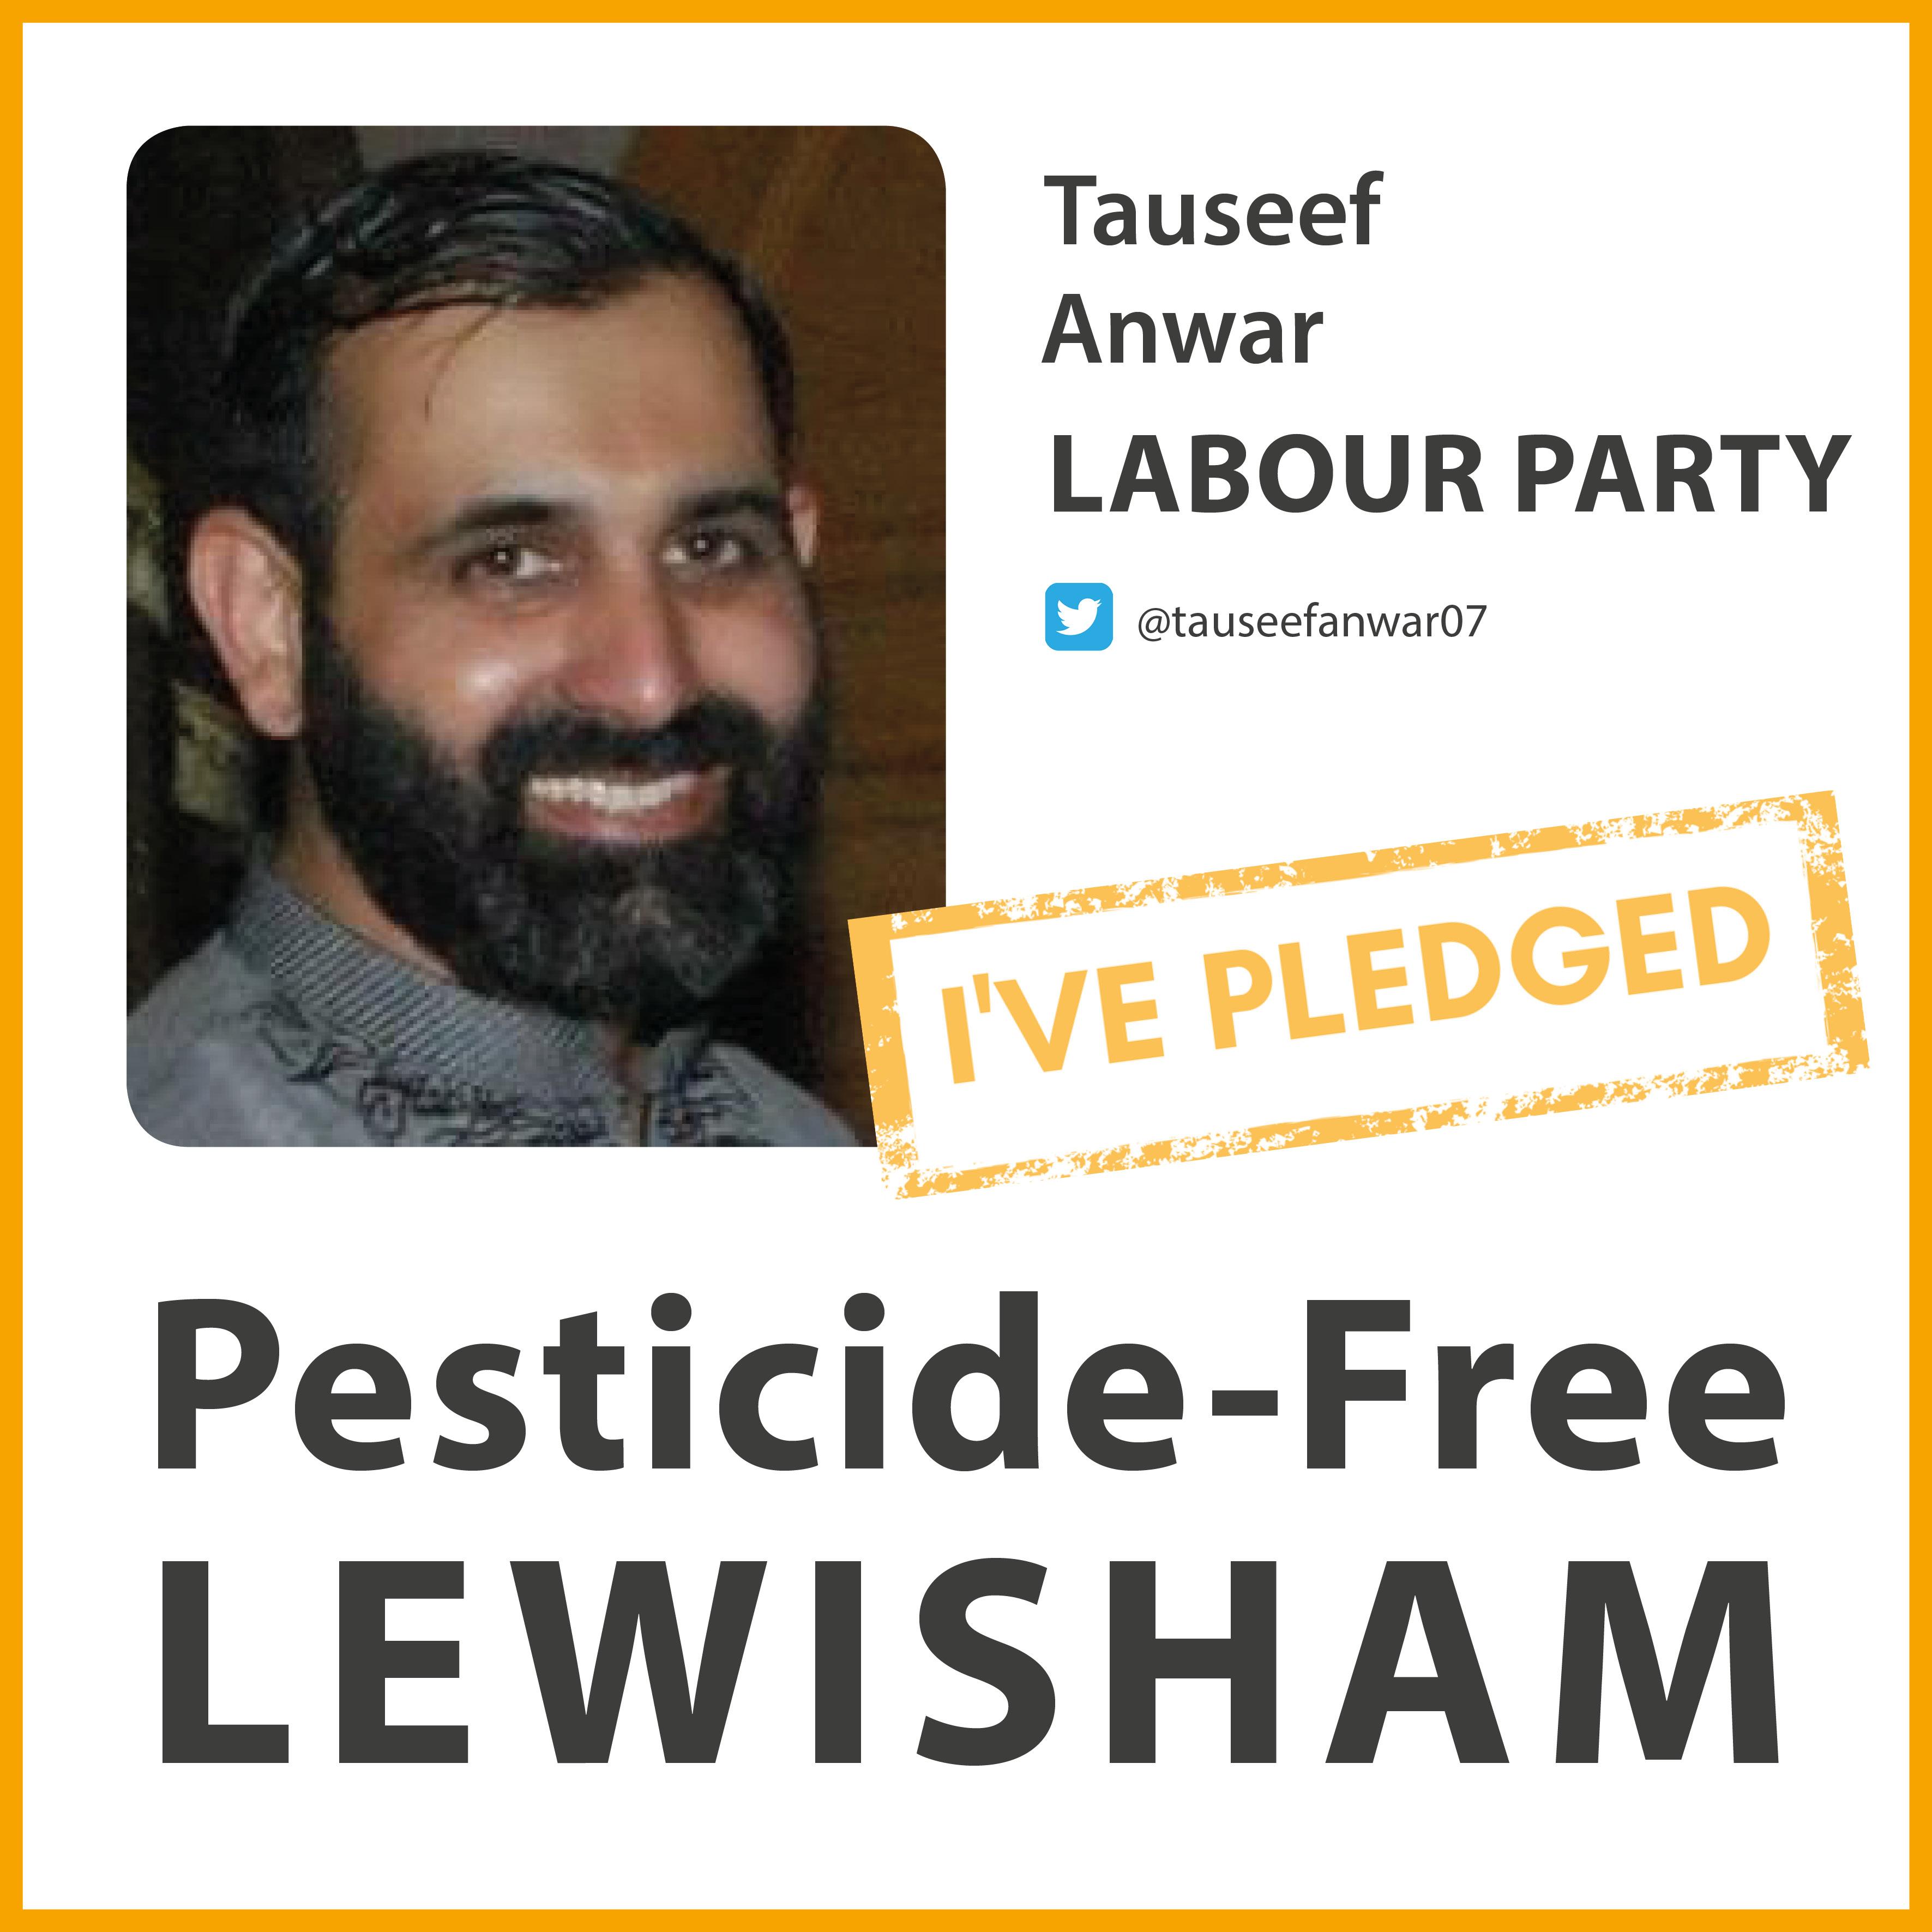 Tauseef Anwar has taken the Pesticide-Free London pledge in Lewisham